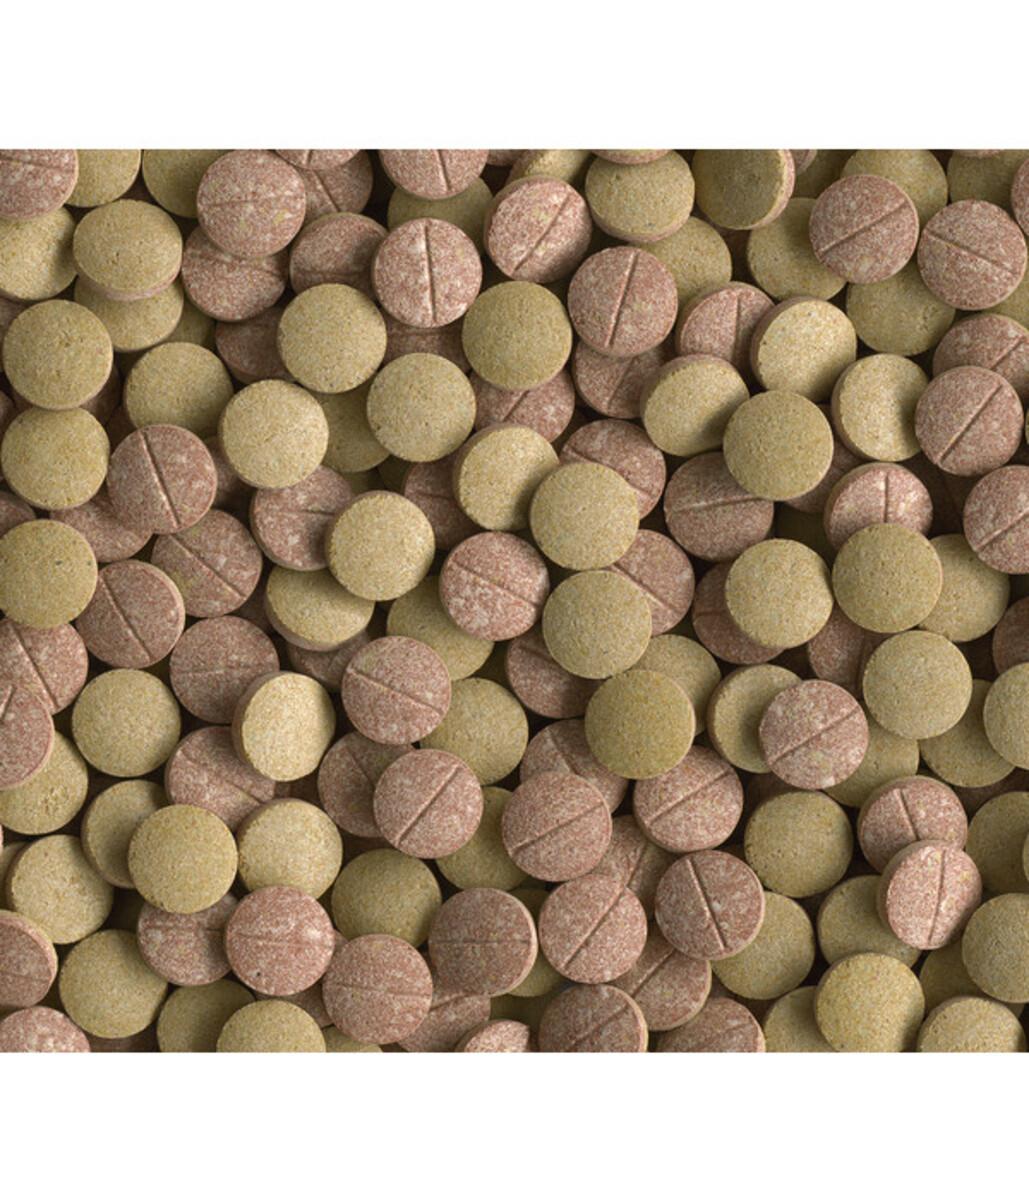 Bild 2 von Tetra Tablets TabiMin XL, 133 Tabletten